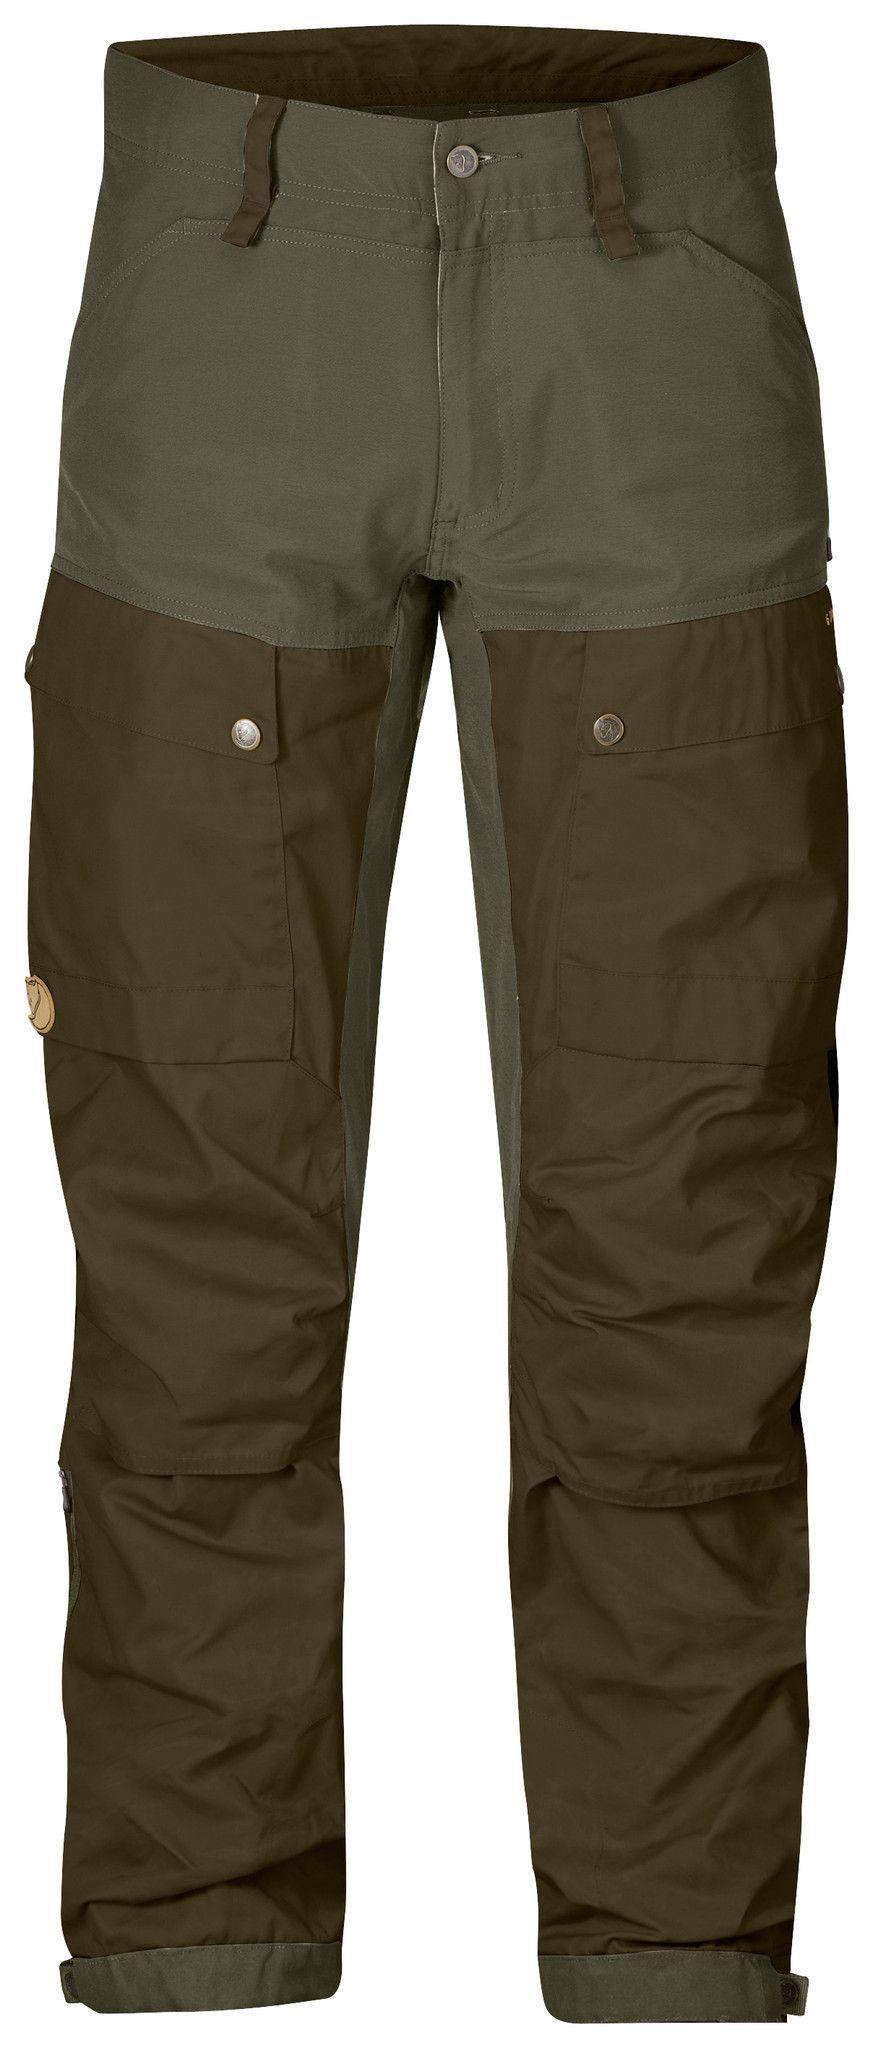 Keb Trousers (Long)